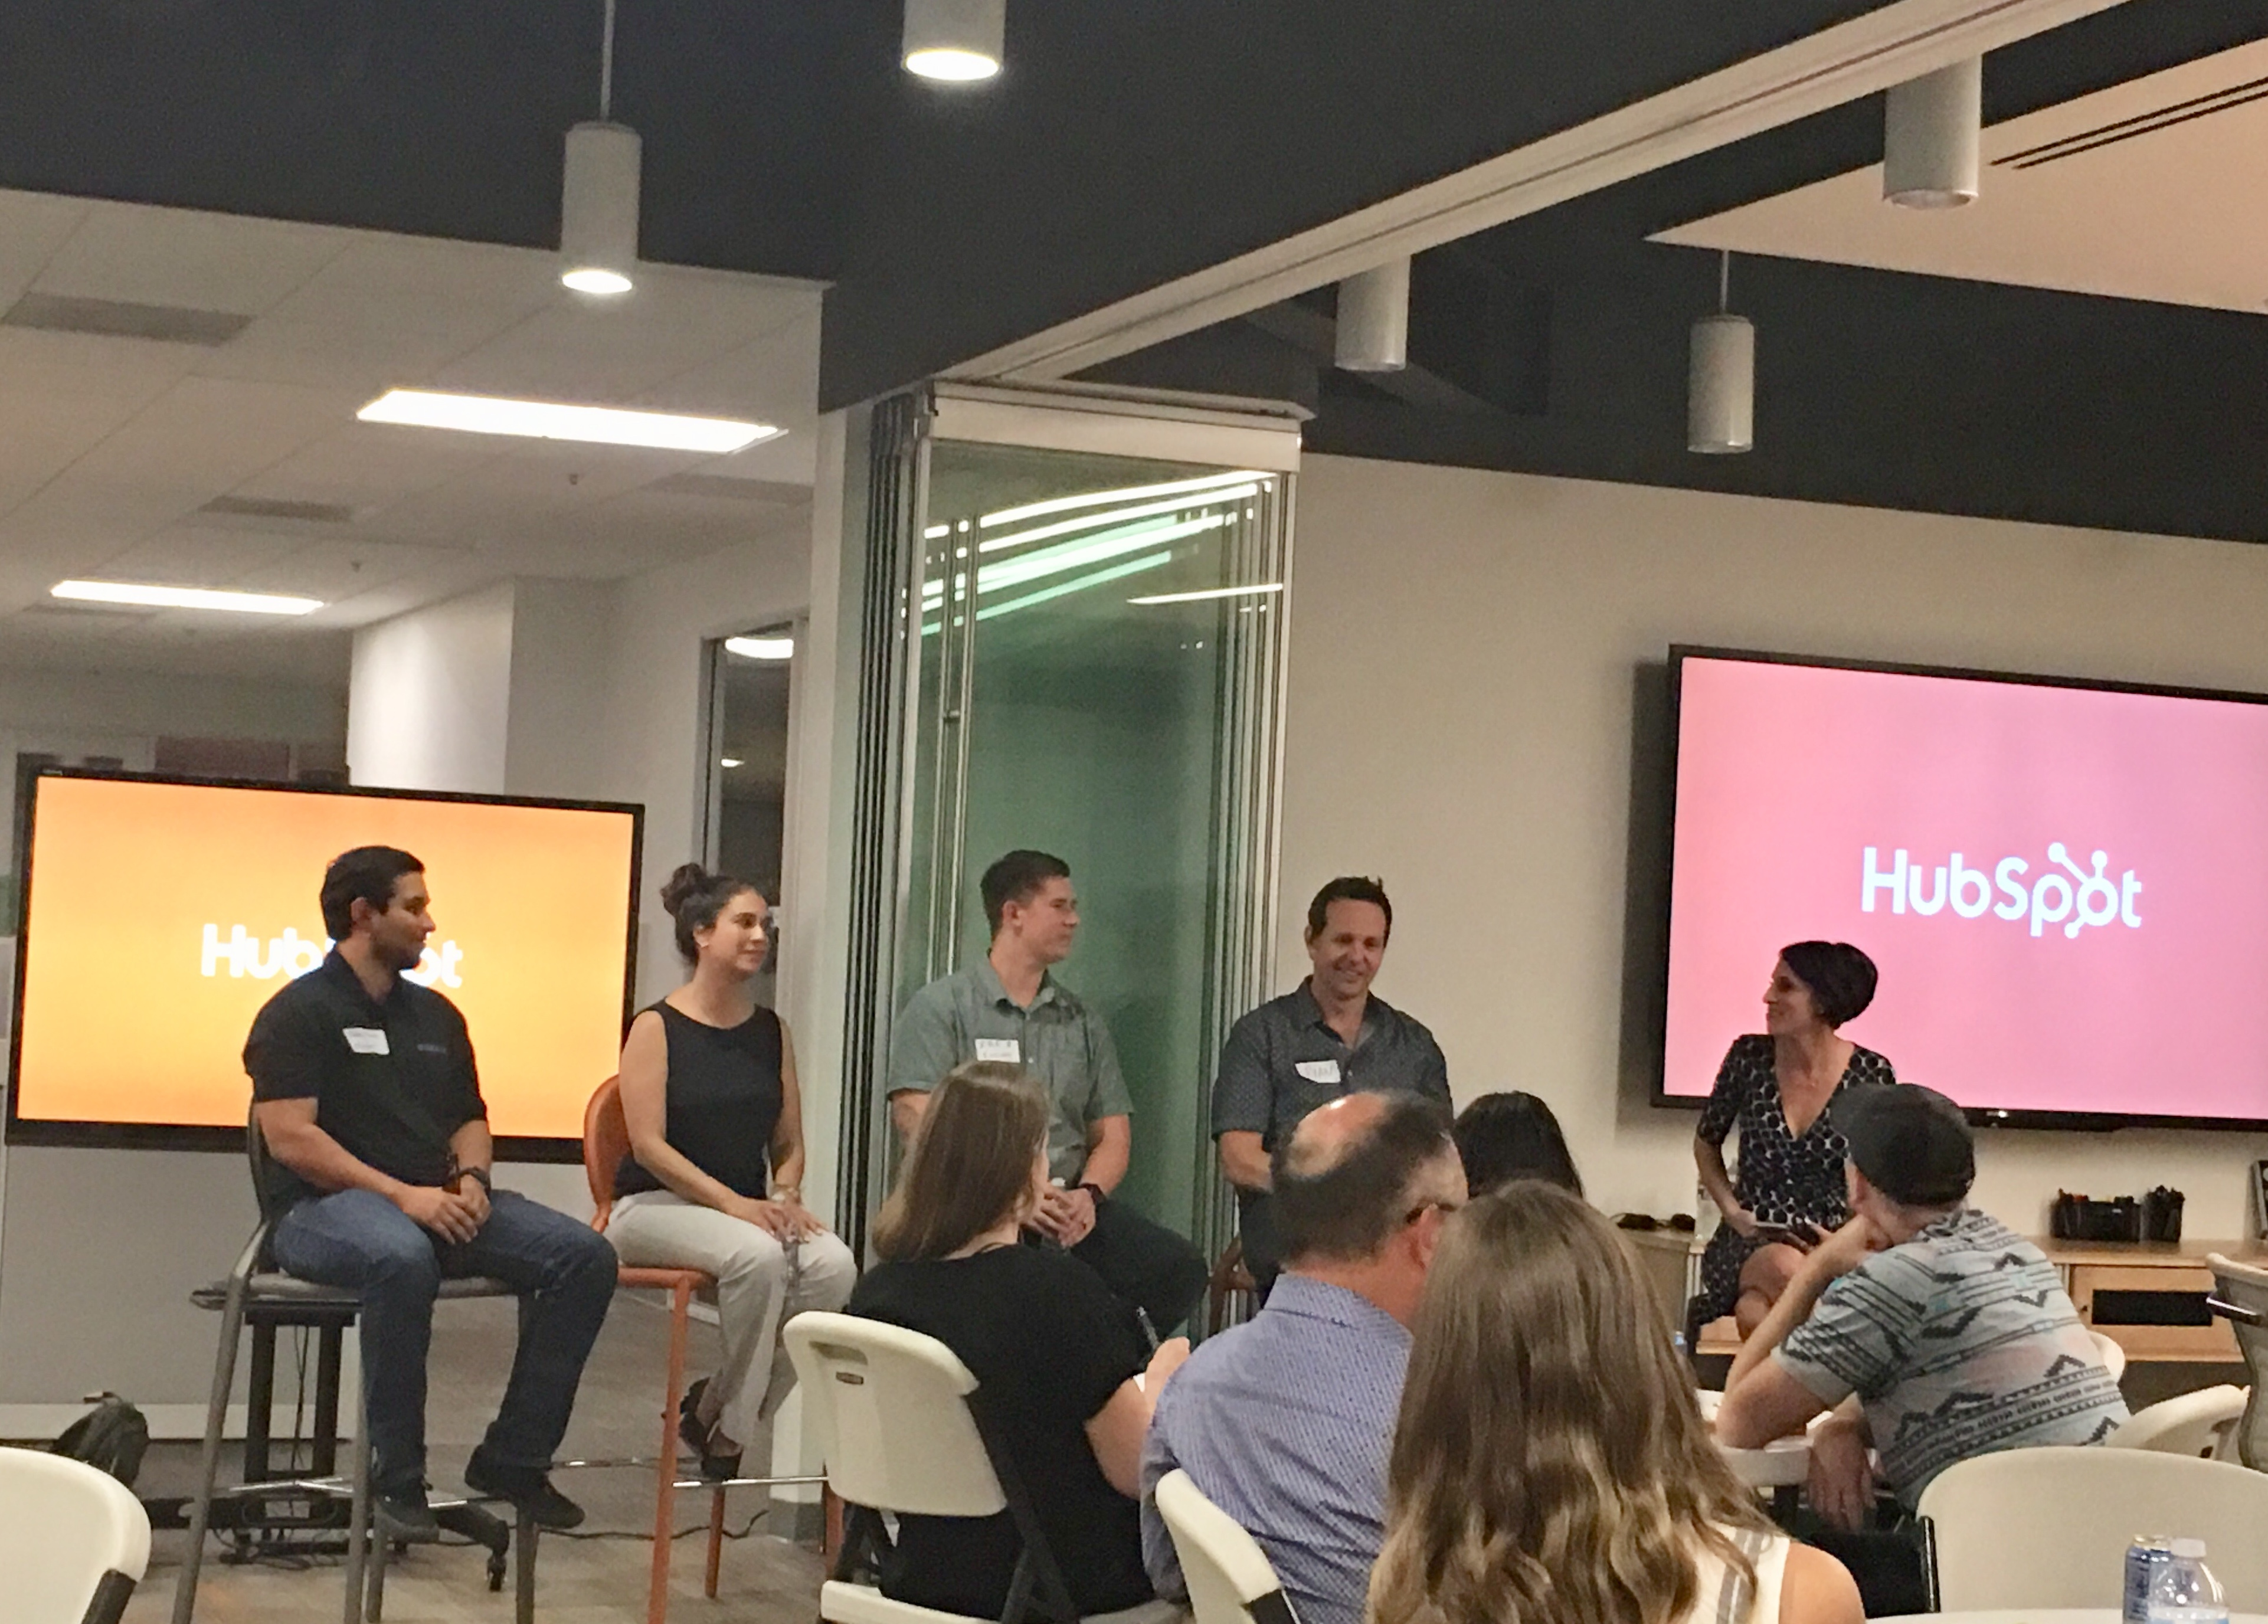 HubSpot's-HUG-OC-User-Panel-Share's-Secrets-How-to-Improve-Inbound-Marketing.jpg